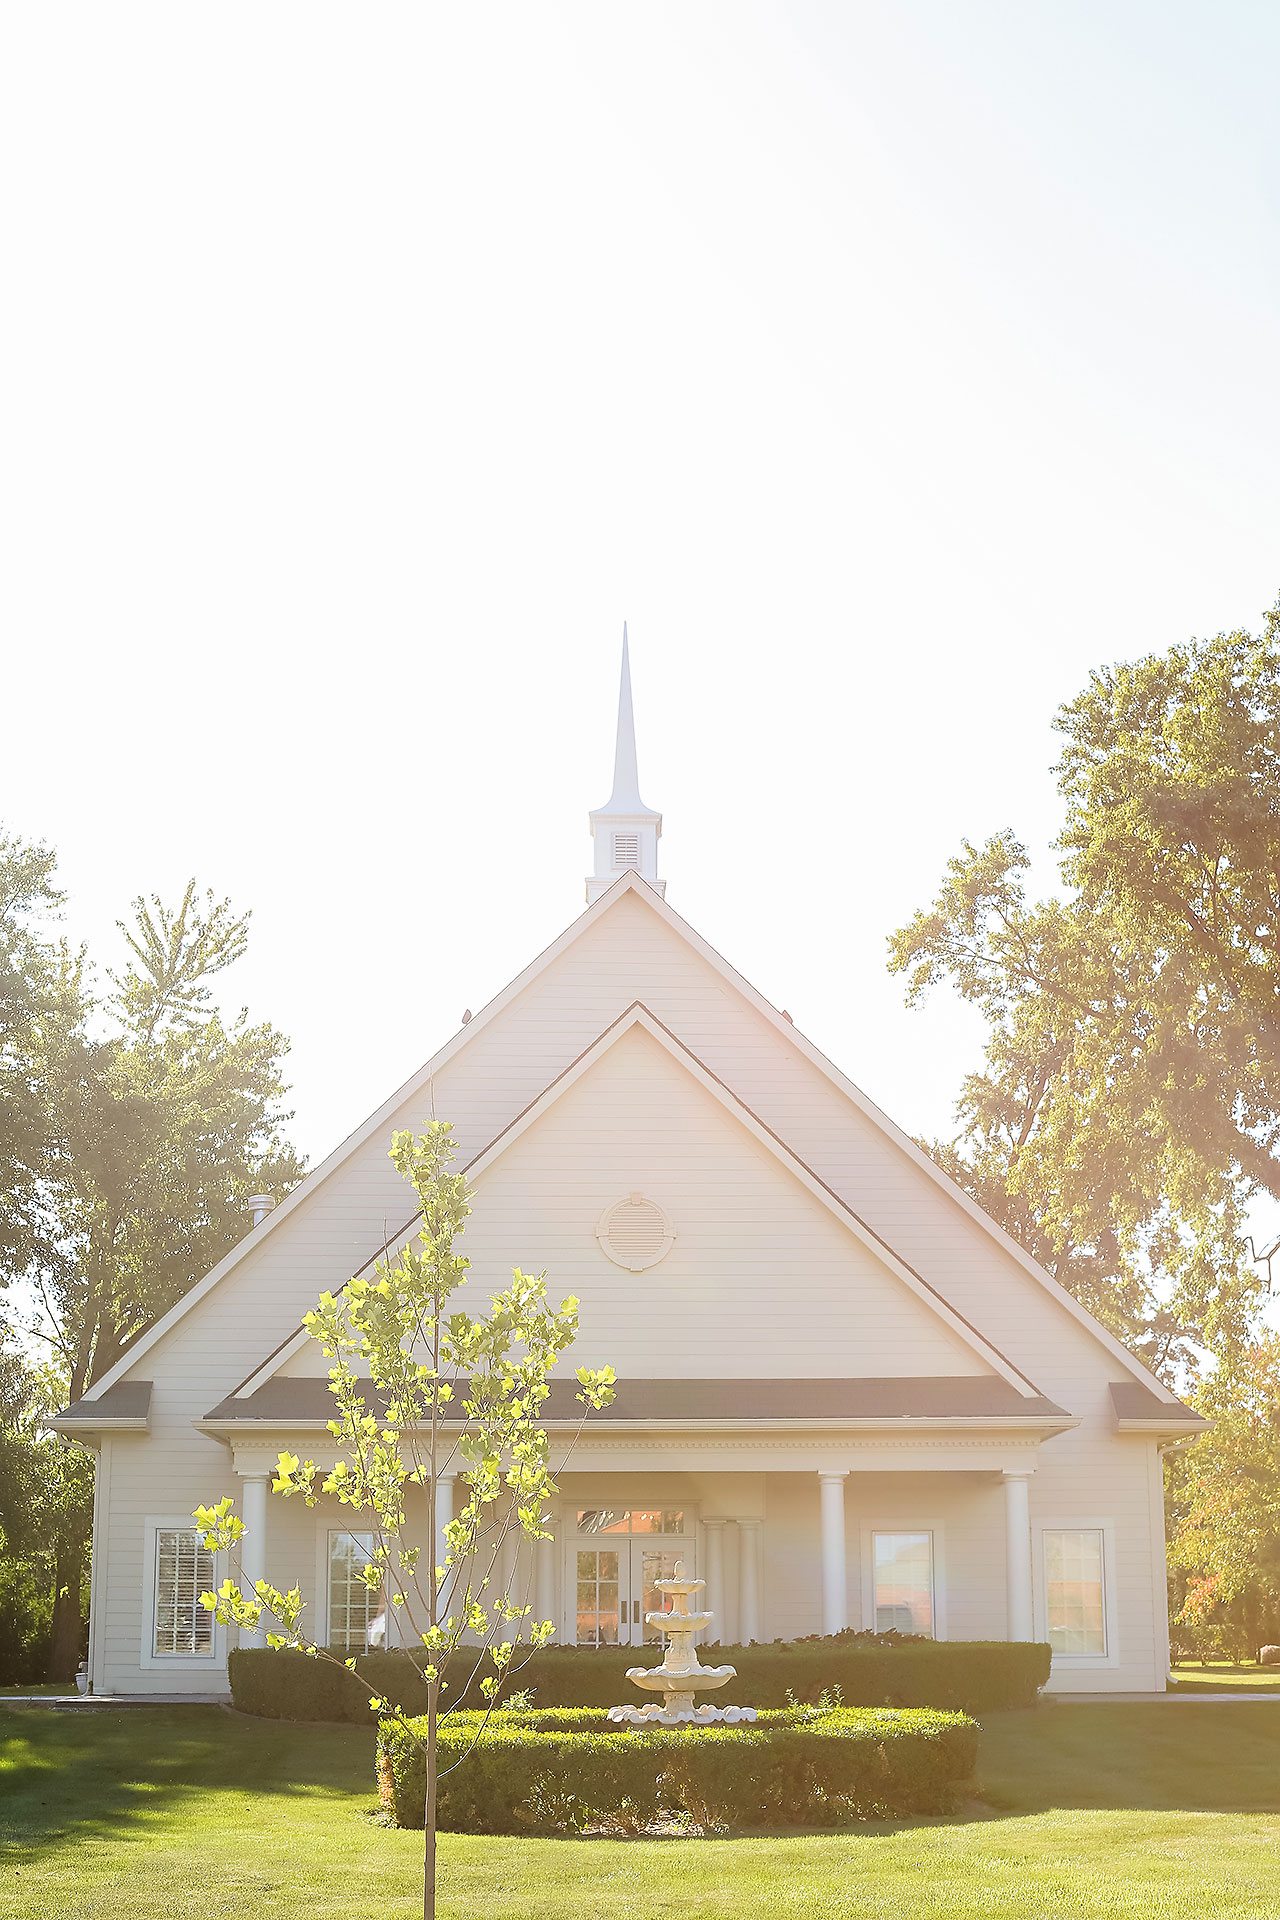 Callie Josh Ritz Charles Garden Pavilion Carmel Indiana Wedding 175